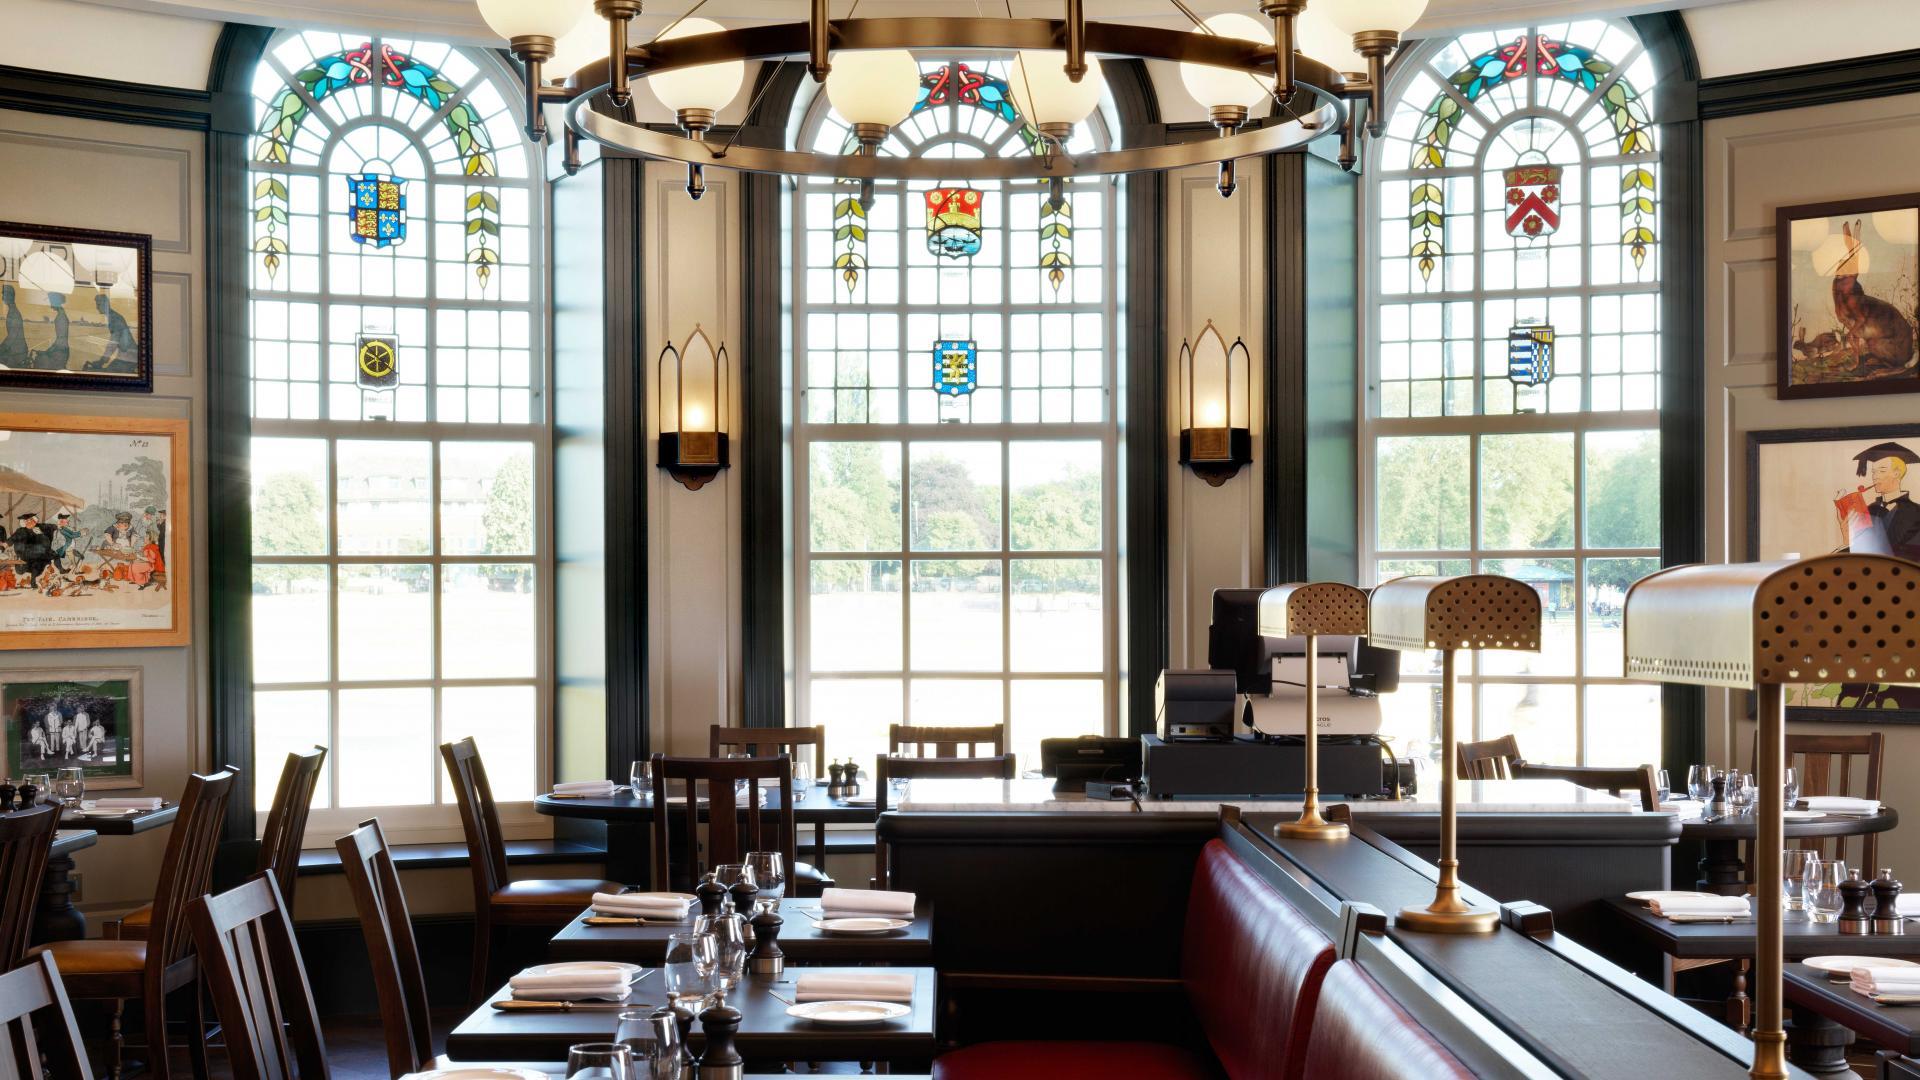 Best restaurants near London: Parker's Tavern at the University Arms, Cambridge